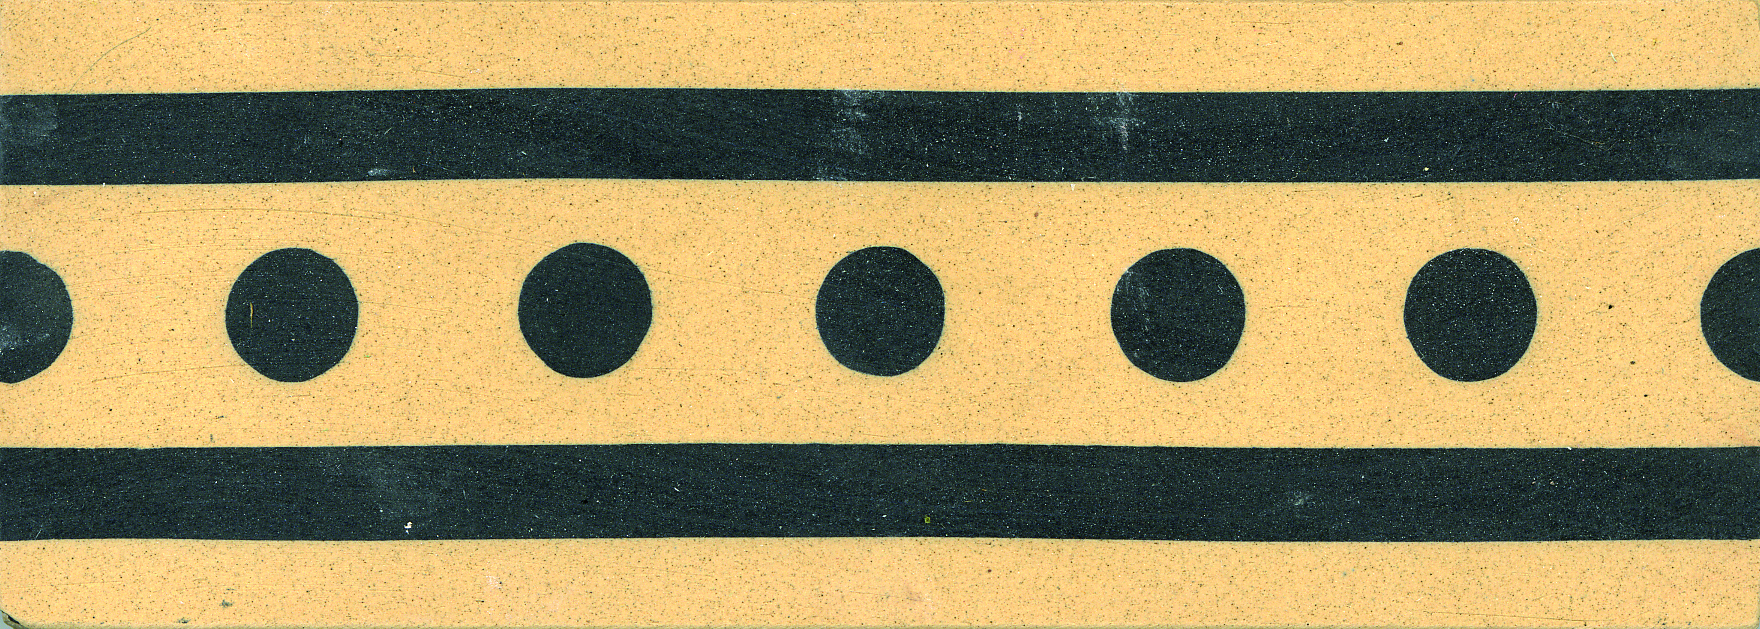 Encaustic Tile Border 152mm x 54mm B2003